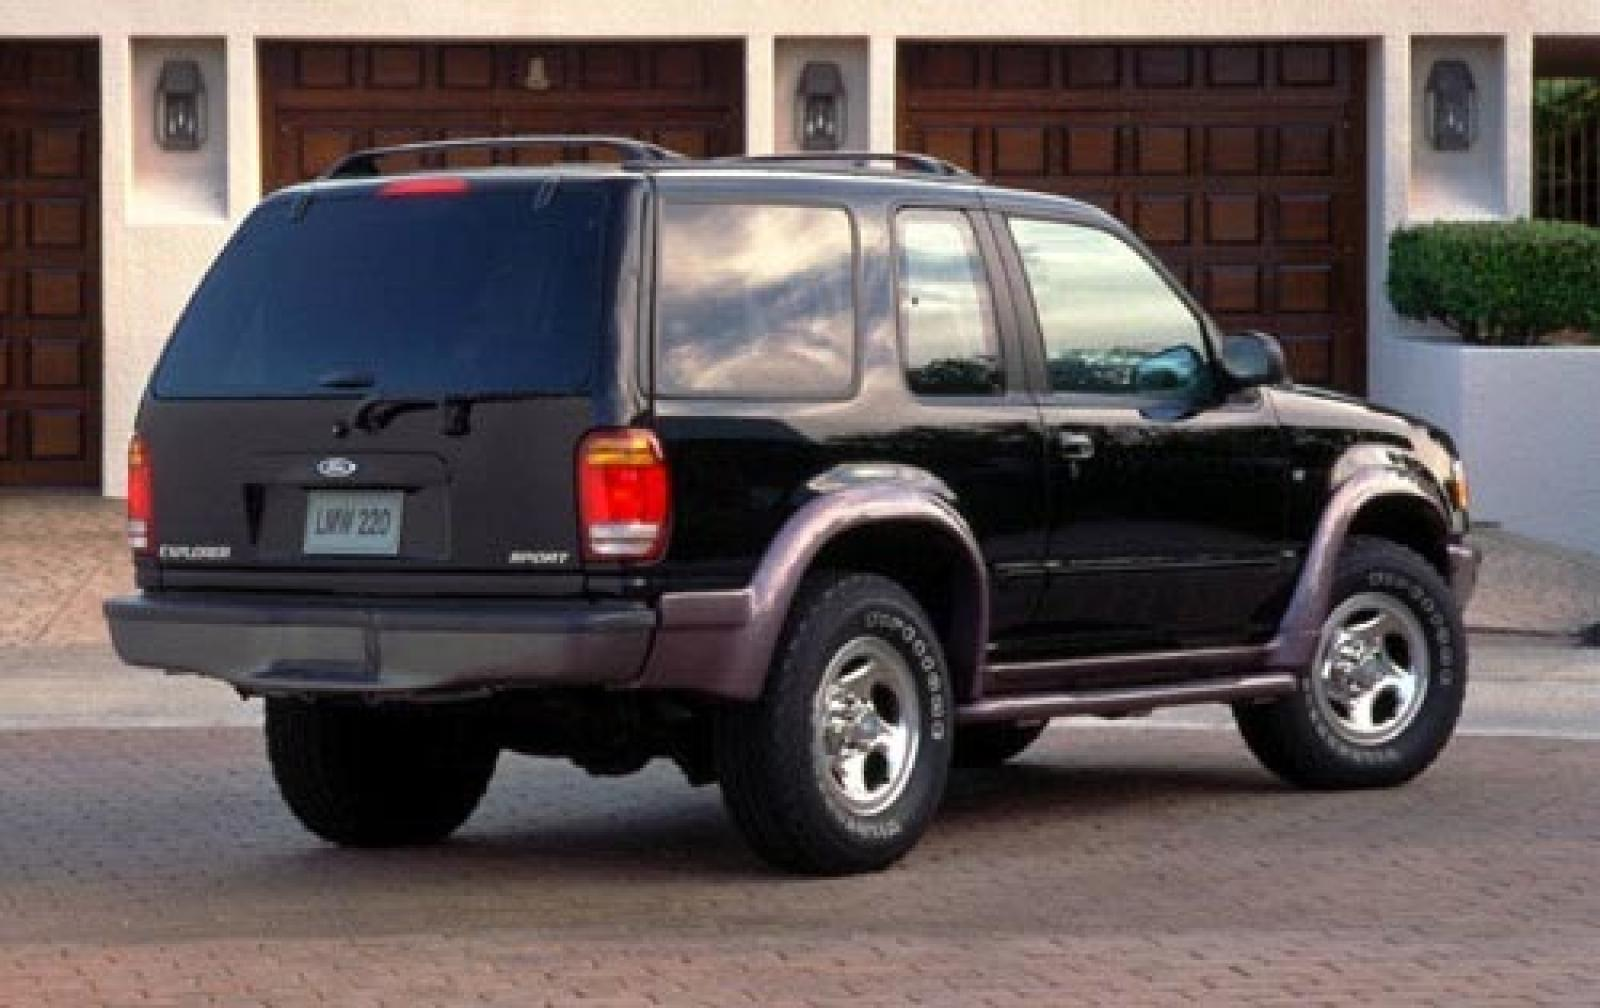 1996 Ford Explorer Information And Photos Zombiedrive 2001 Eddie Bauer Expedition 4wd 5 4 Liter Engine Diagram 800 1024 1280 1600 Origin